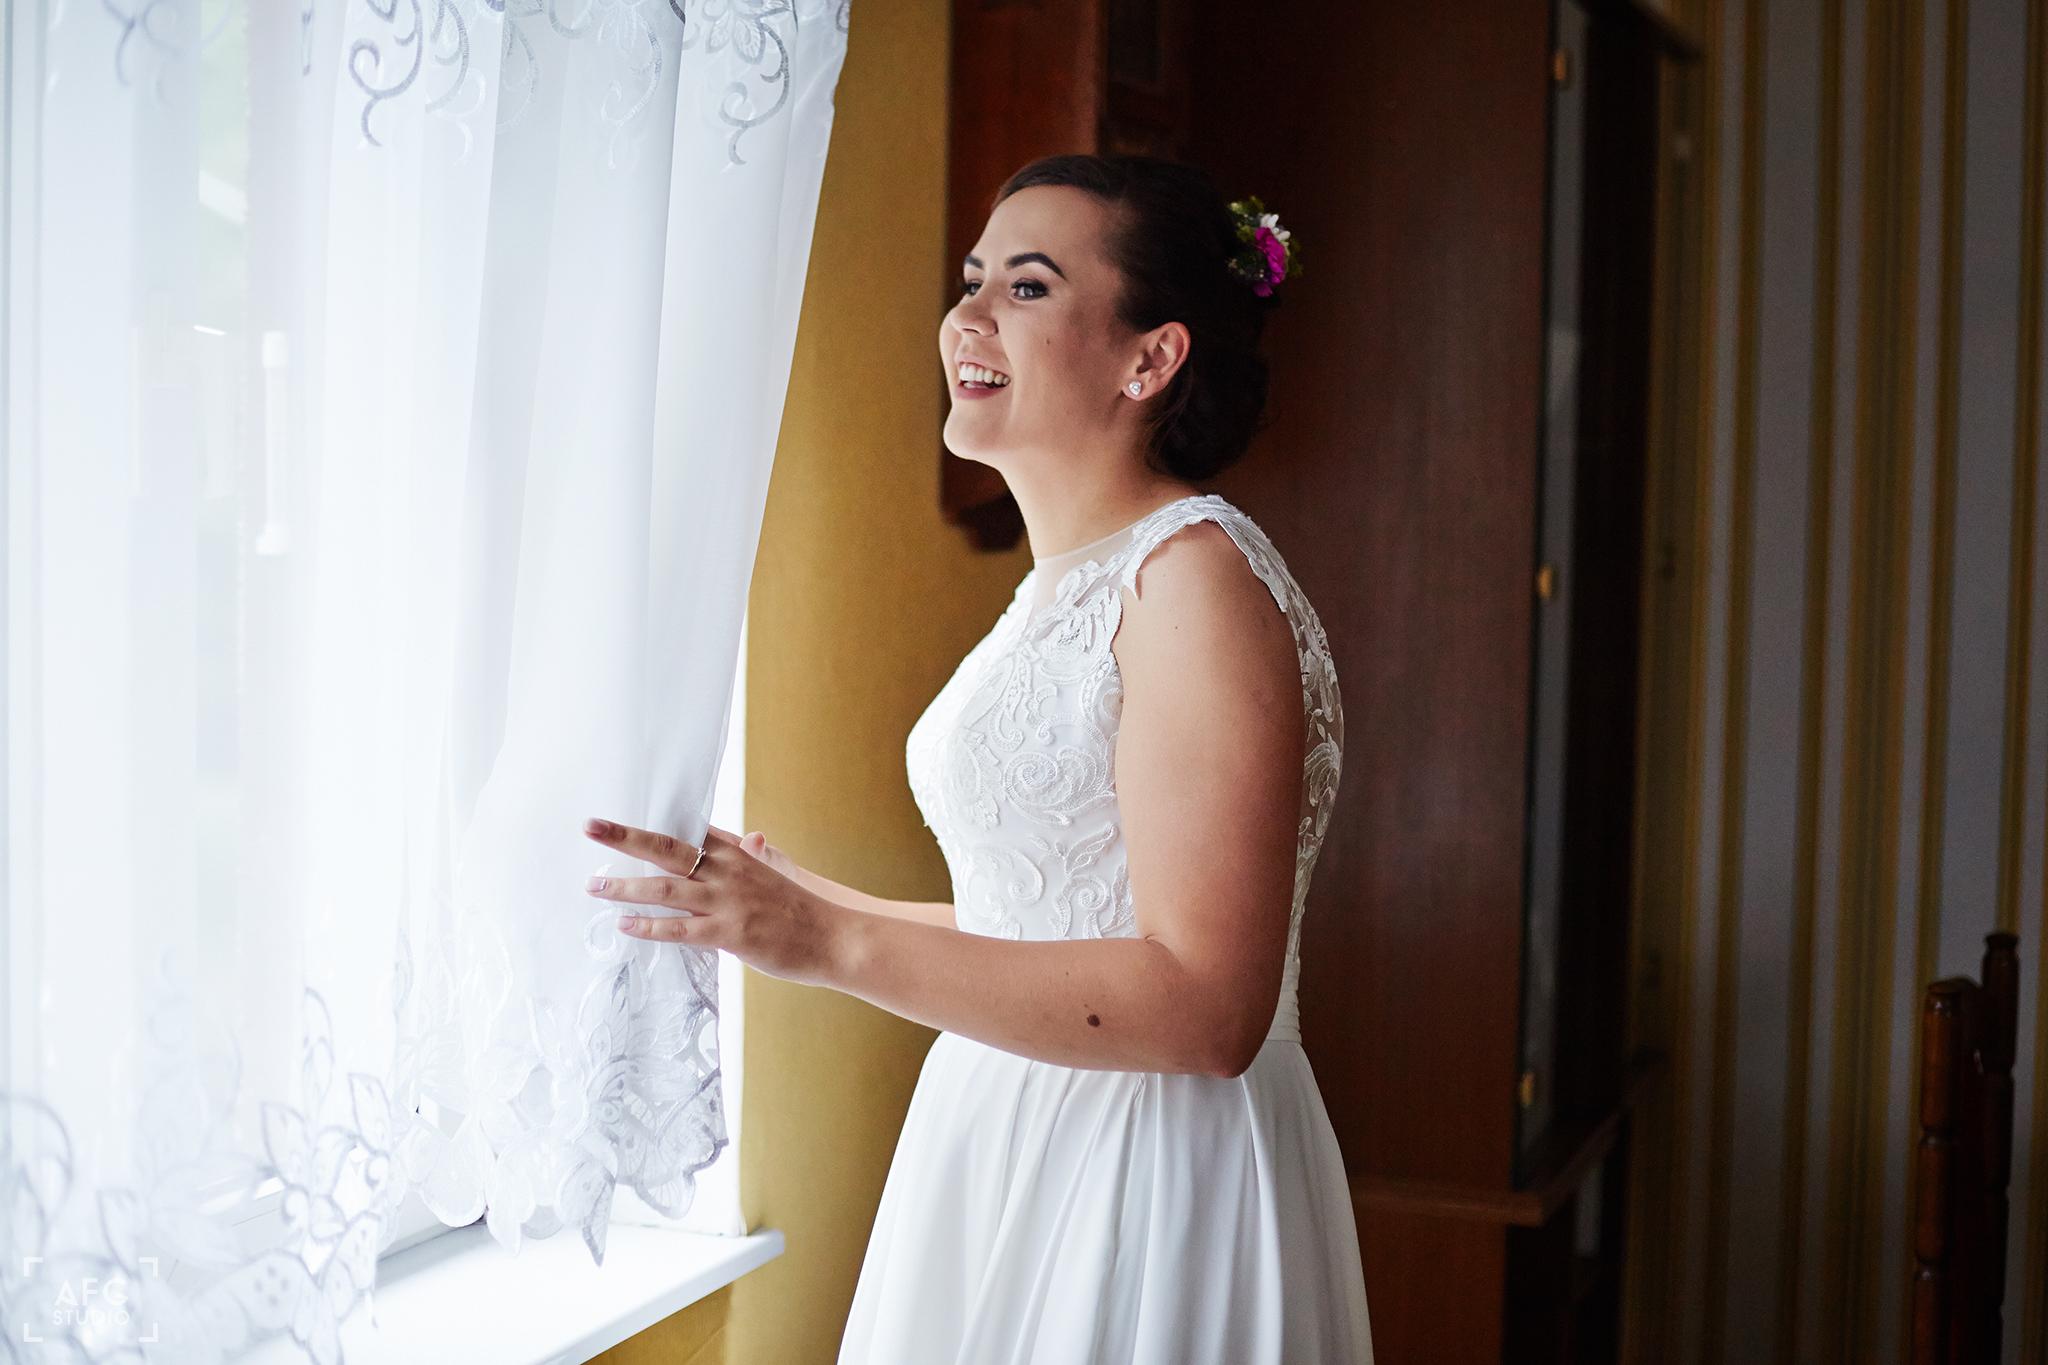 panna młoda, suknia ślubna